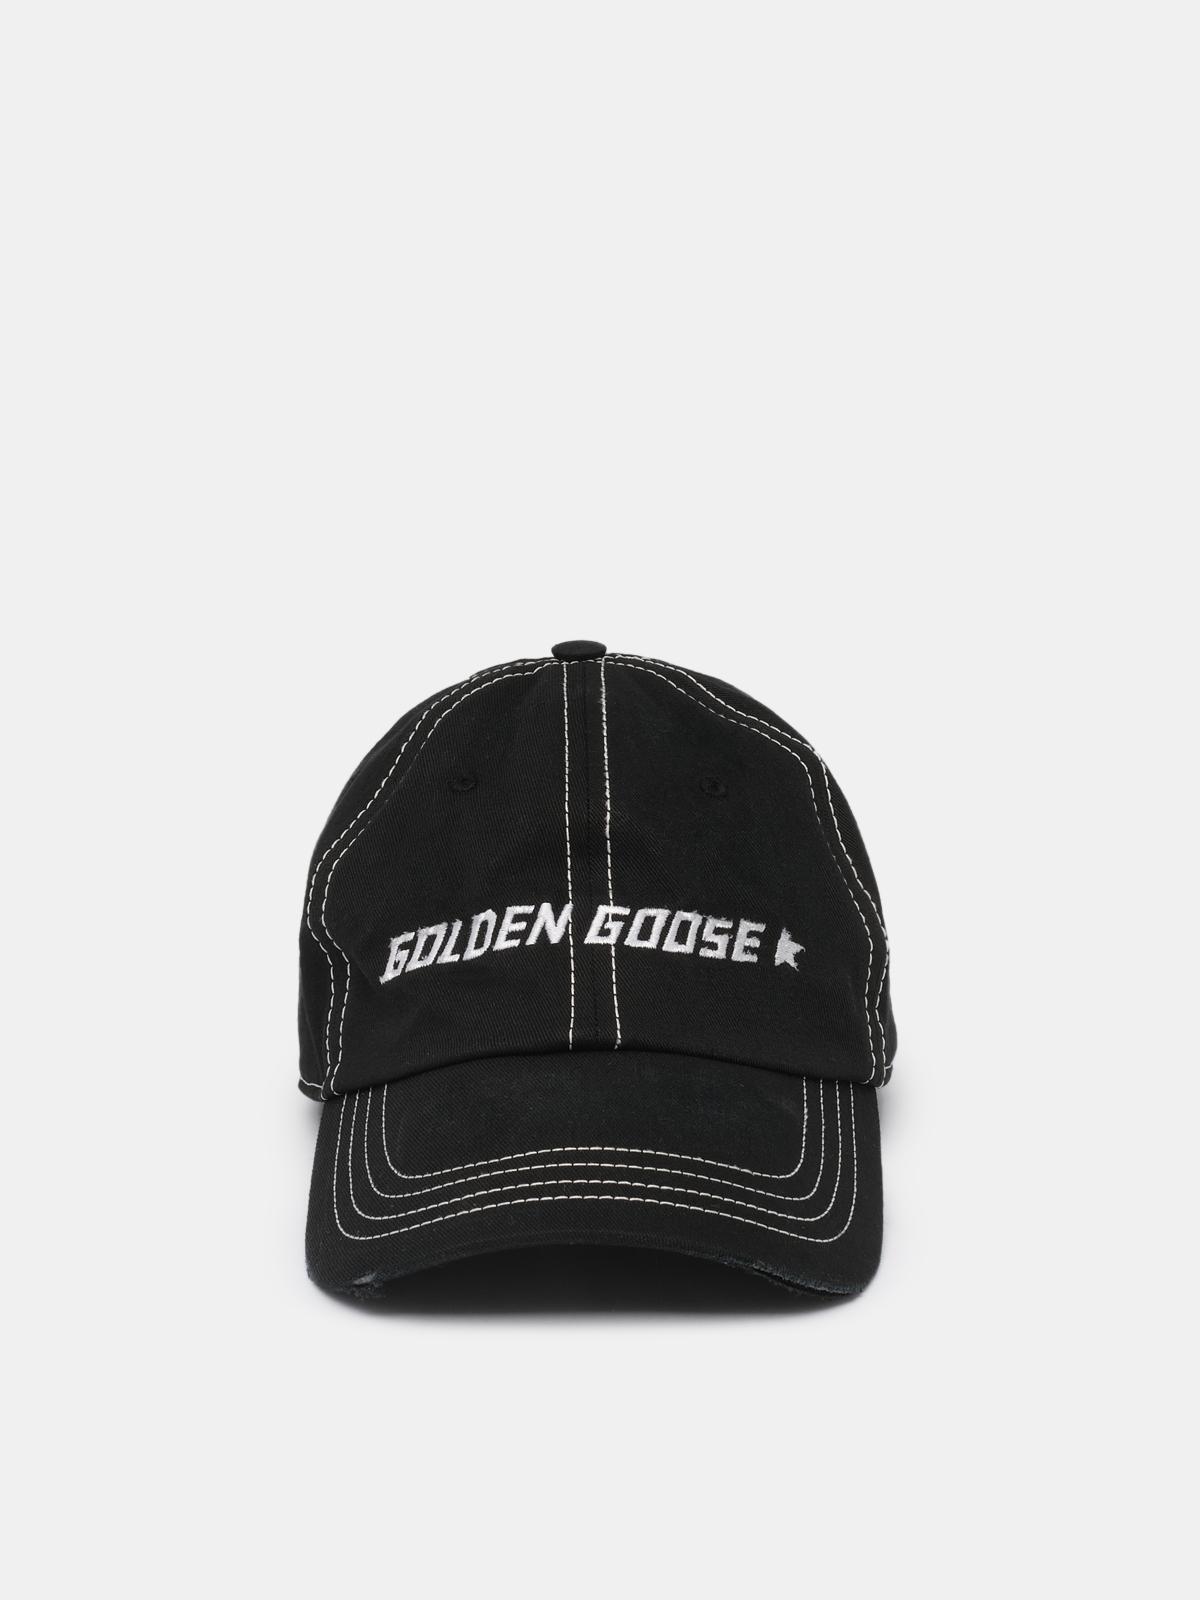 Golden Goose - Aden black baseball cap with contrasting logo in